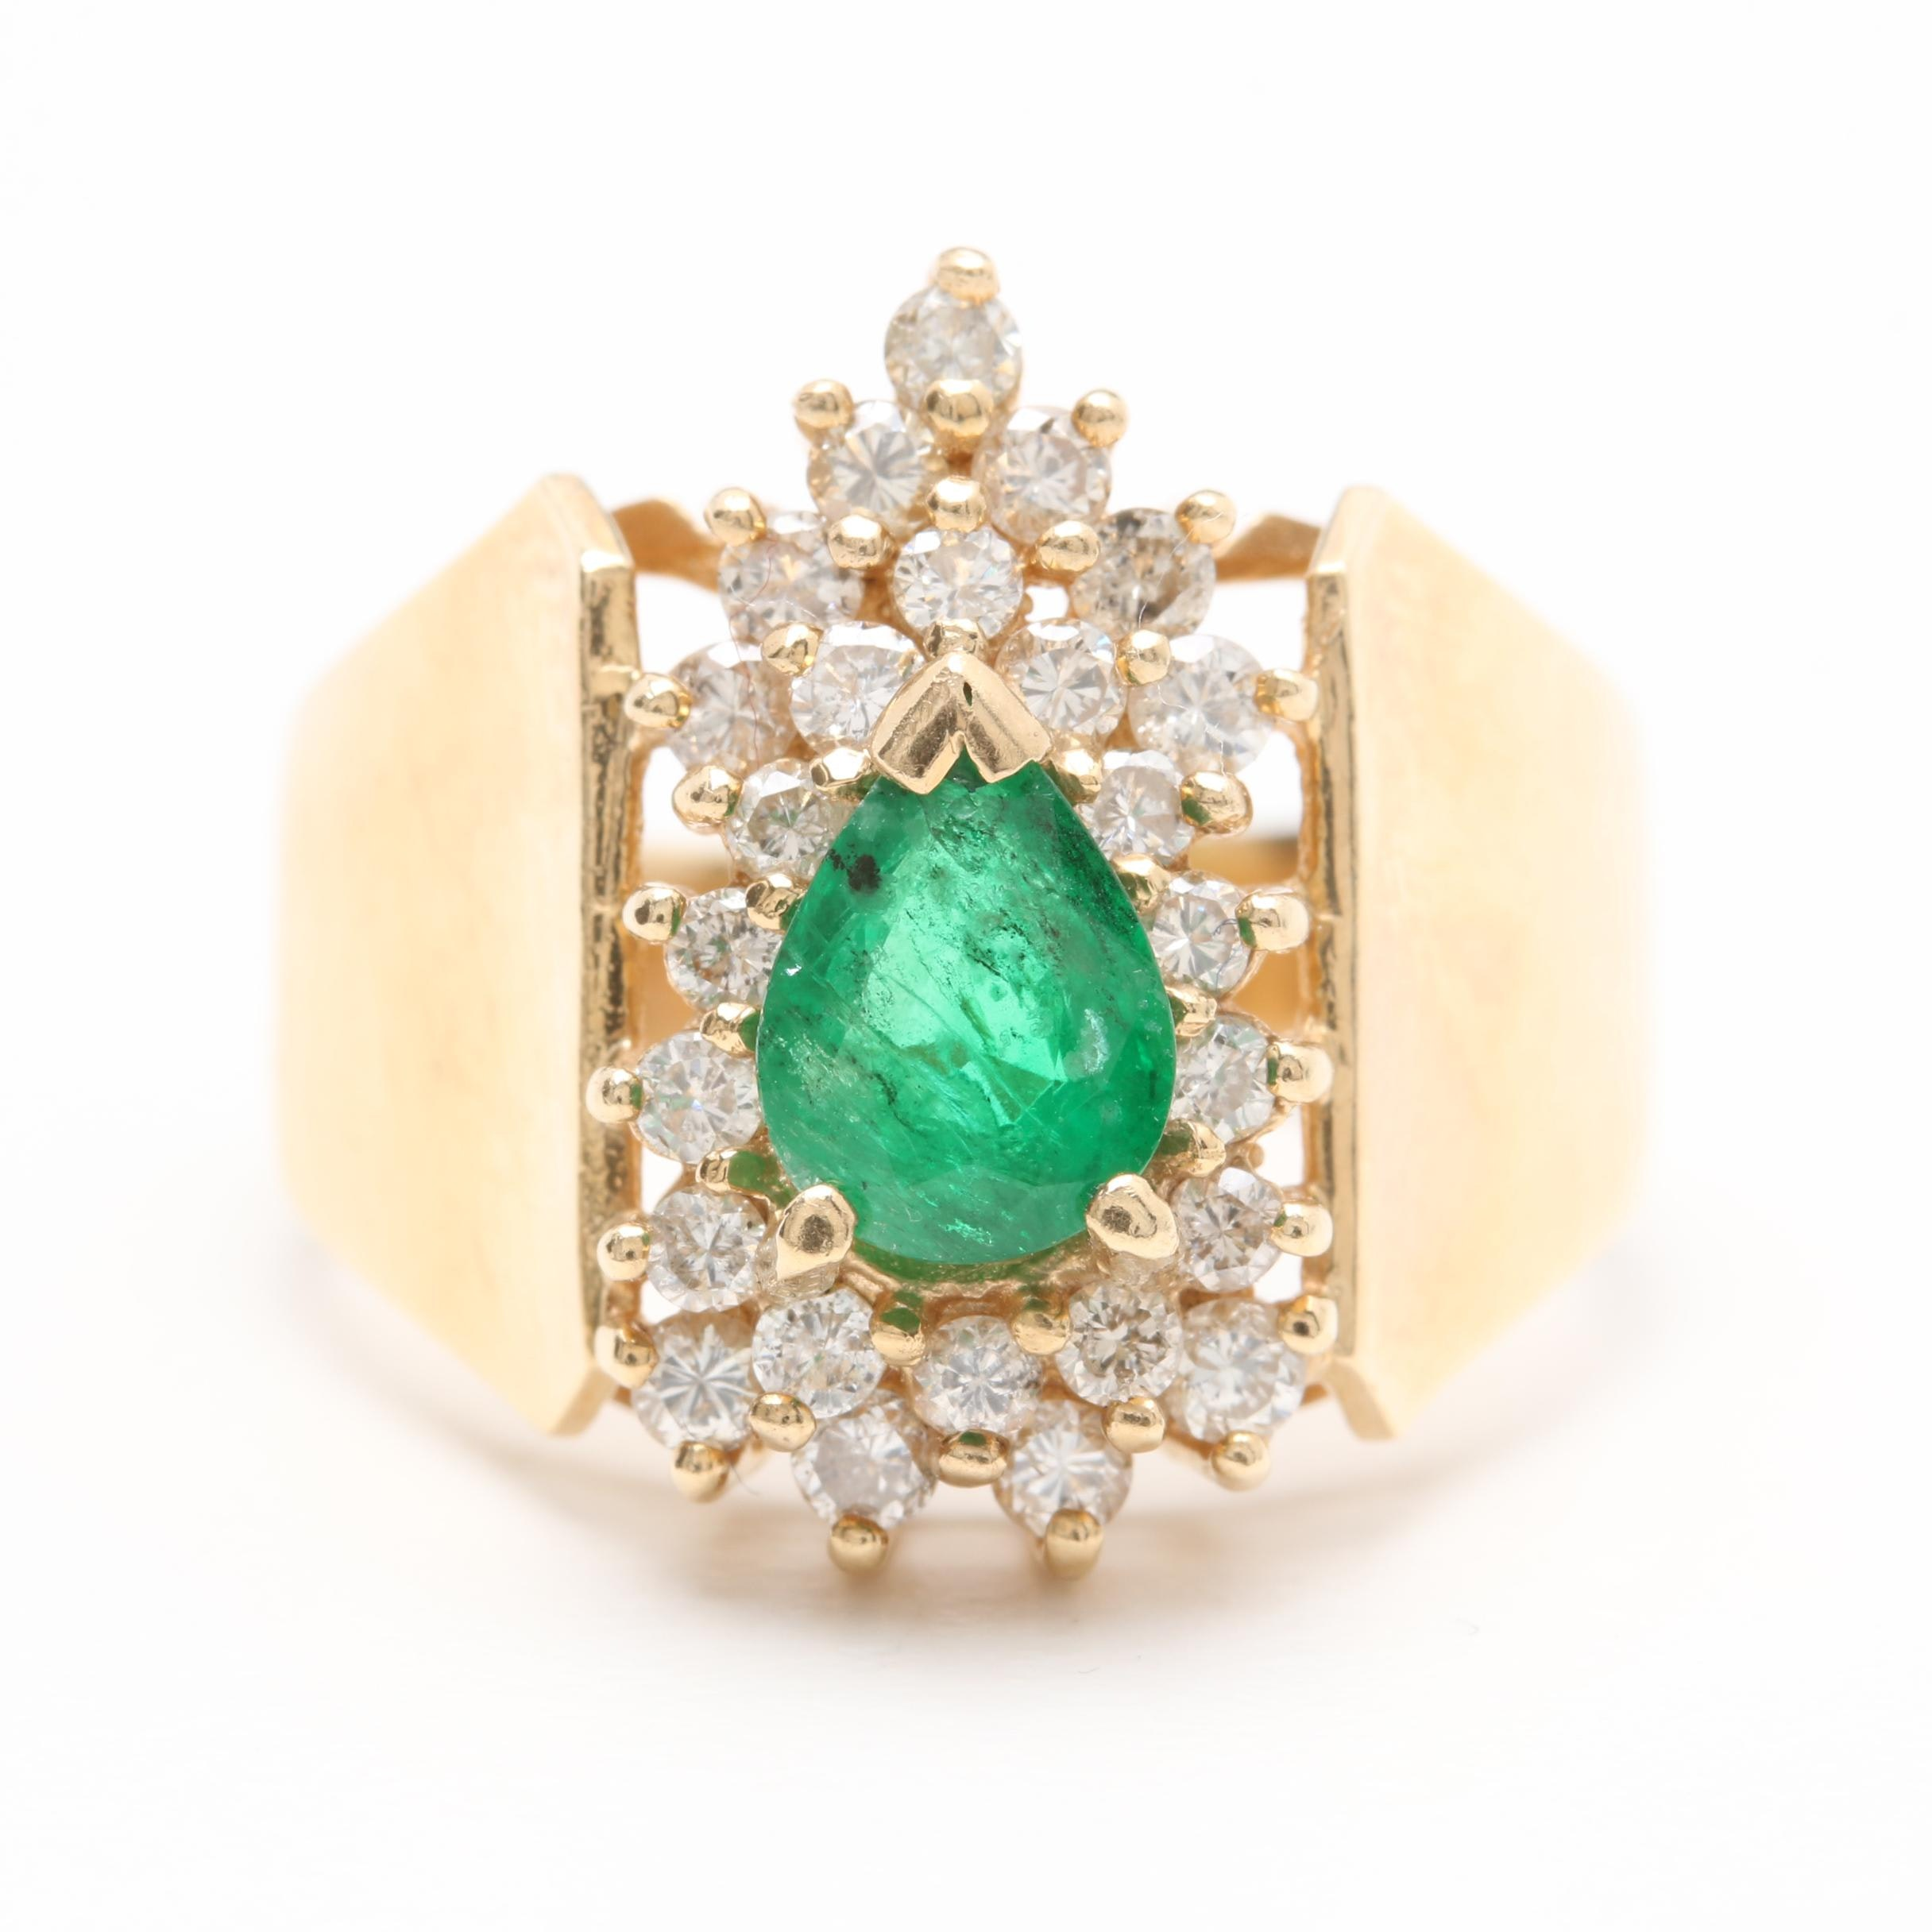 Effy 14K Yellow Gold 0.95 CT Emerald and Diamond Ring